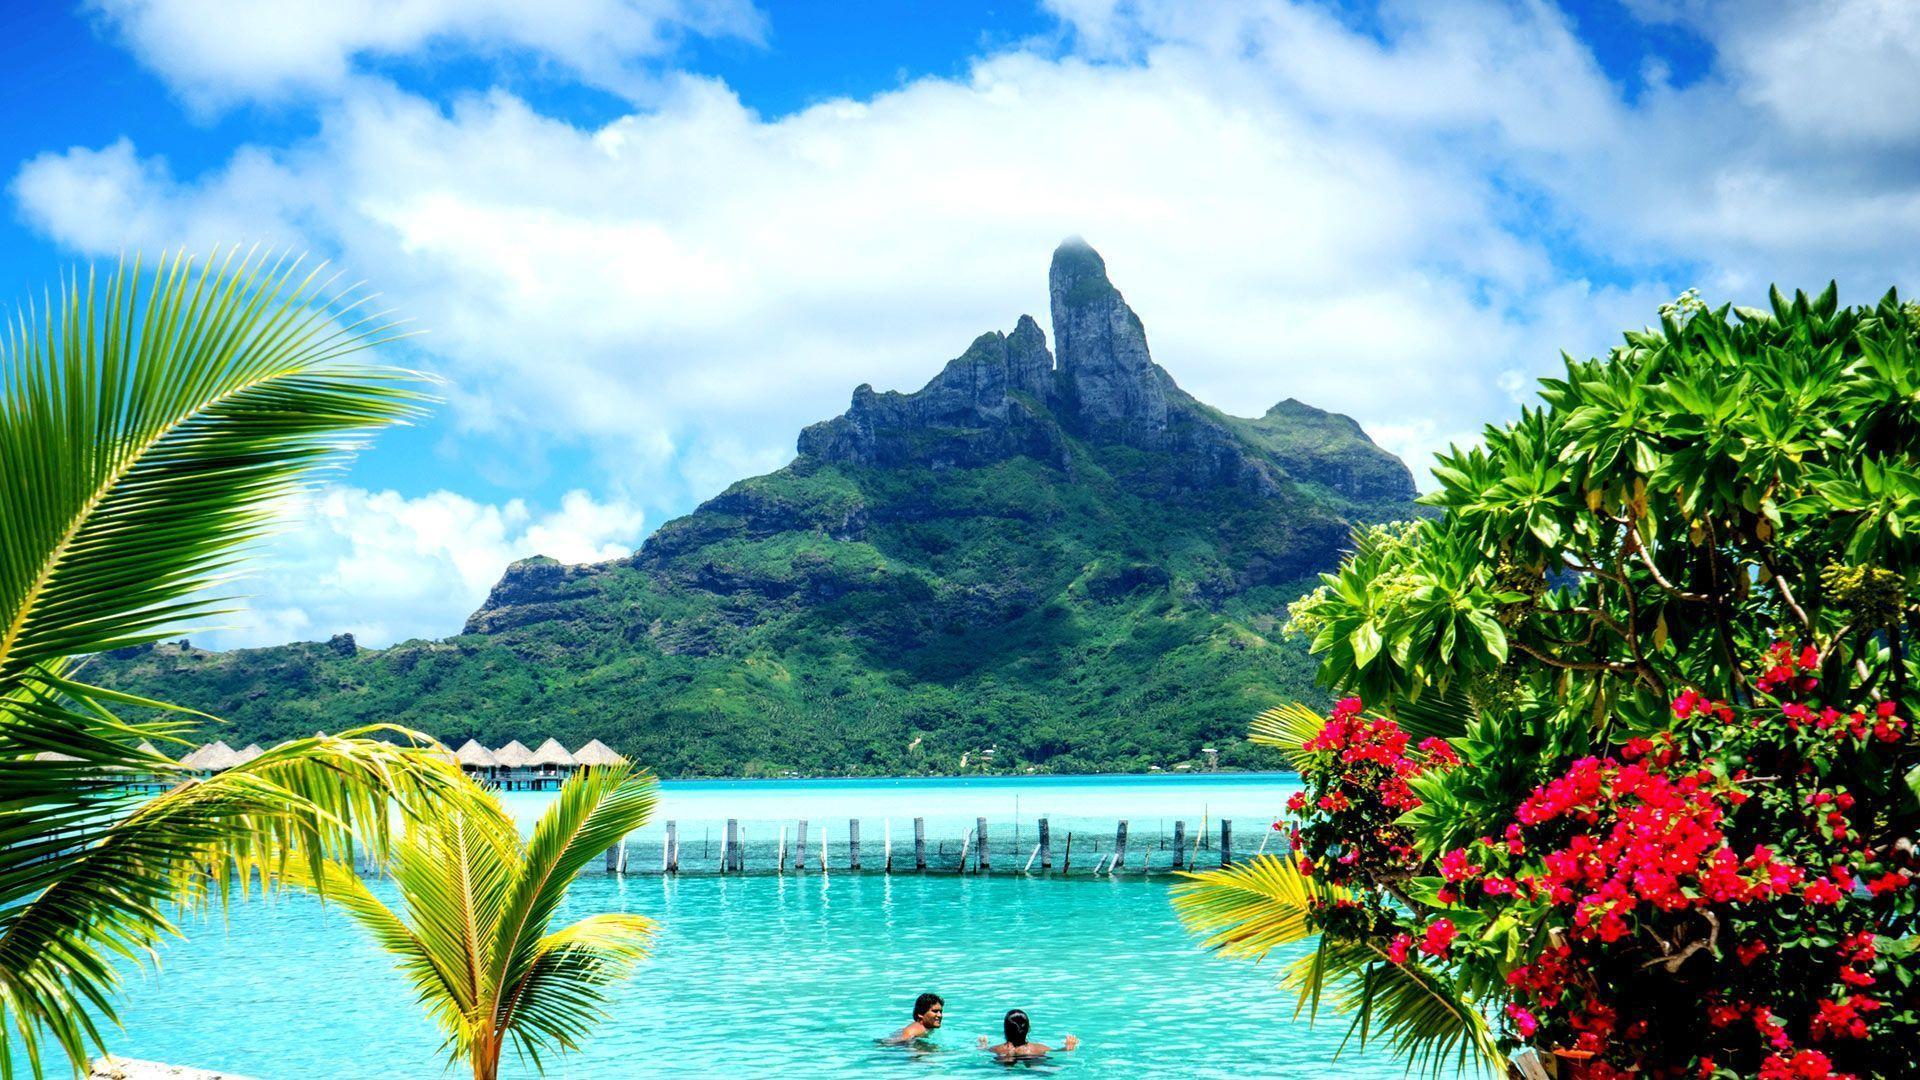 Bora Bora Wallpapers - Top Free Bora Bora Backgrounds ...